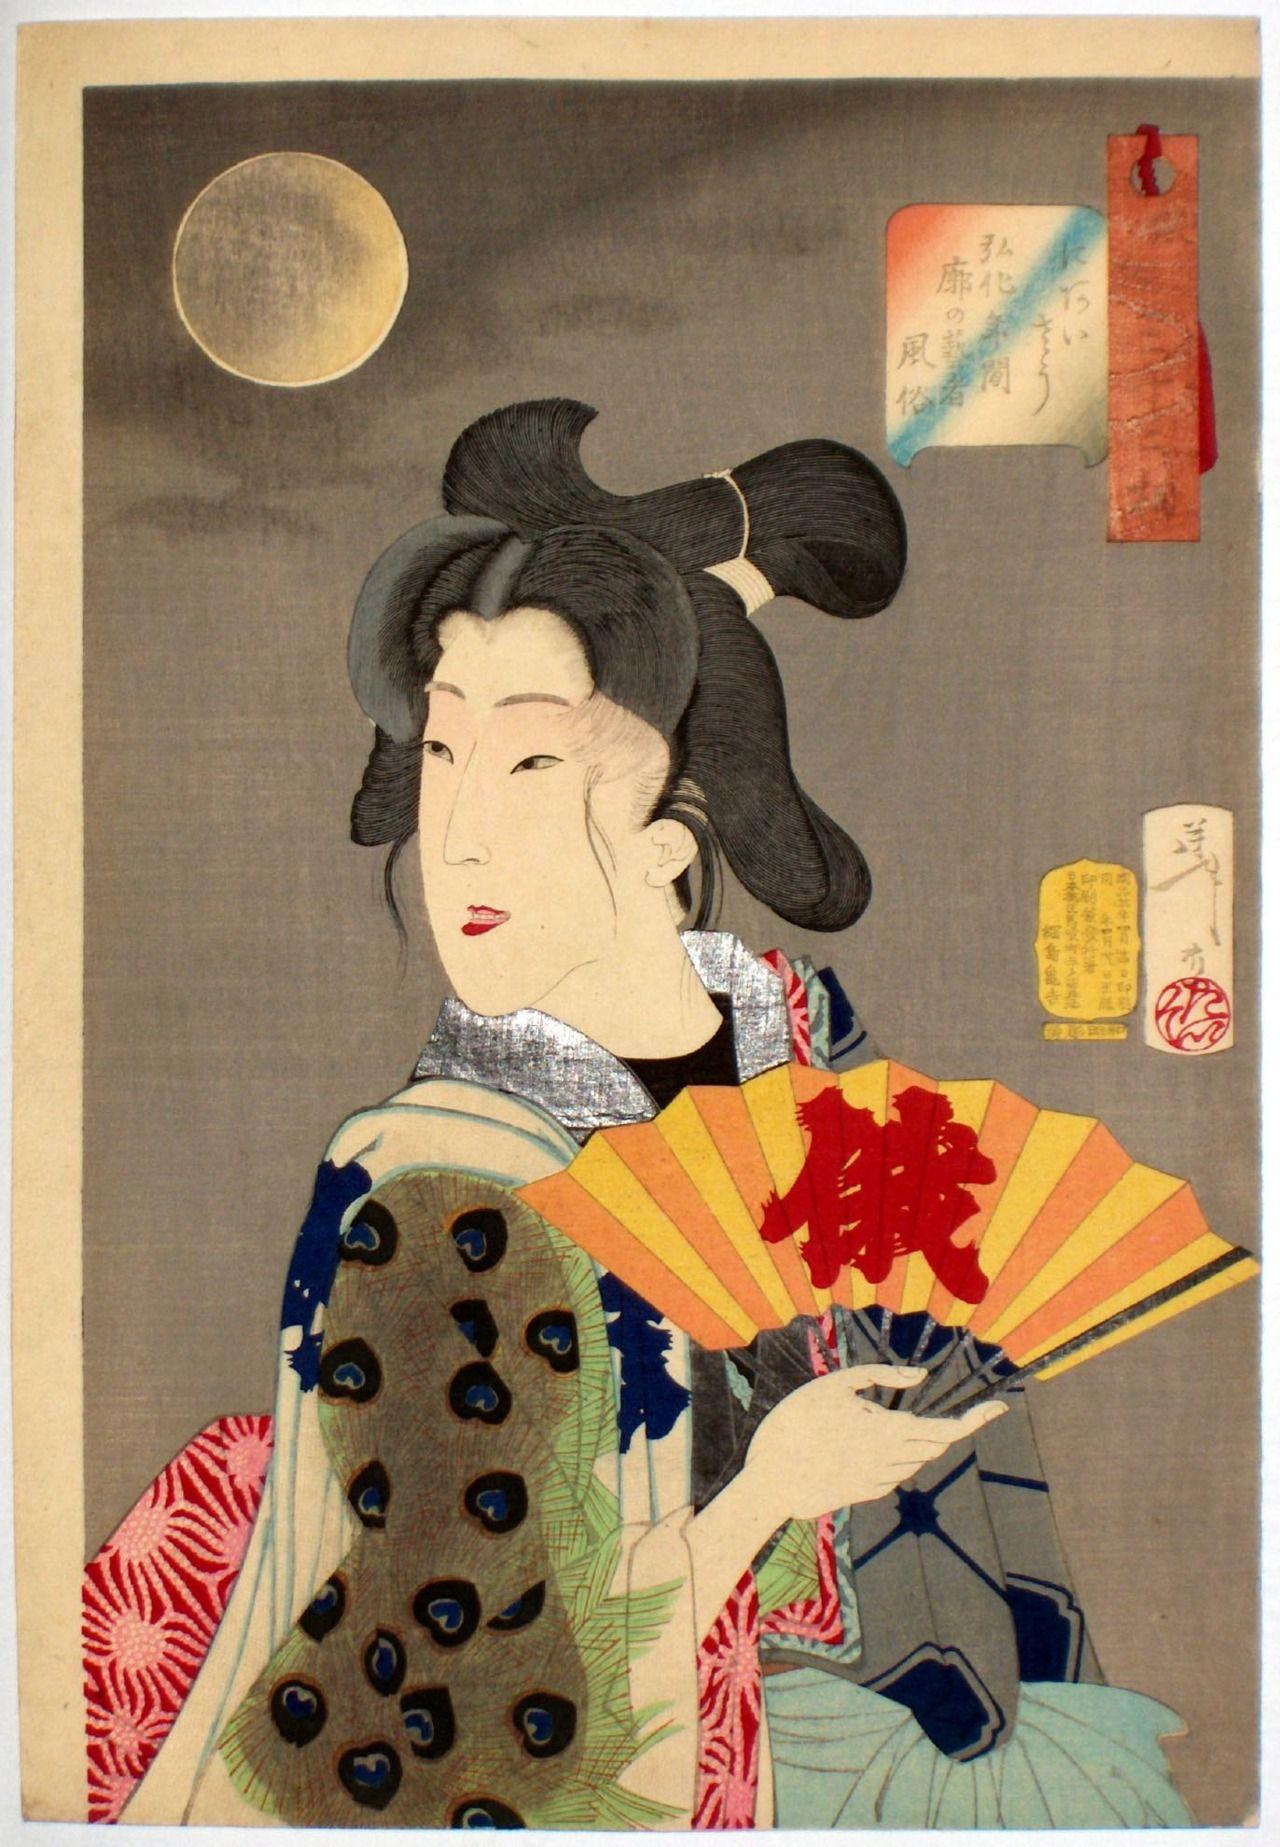 "Tsukioka YOSHITOSHI (1839-1892)  ""Looking Suitable: The Appearance of a Brothel Geisha of the Koka Era"" ( 1844-1848 ). From the set: Thirty-two Aspects of Women published by Tsunashima Kamekichi, 1888."